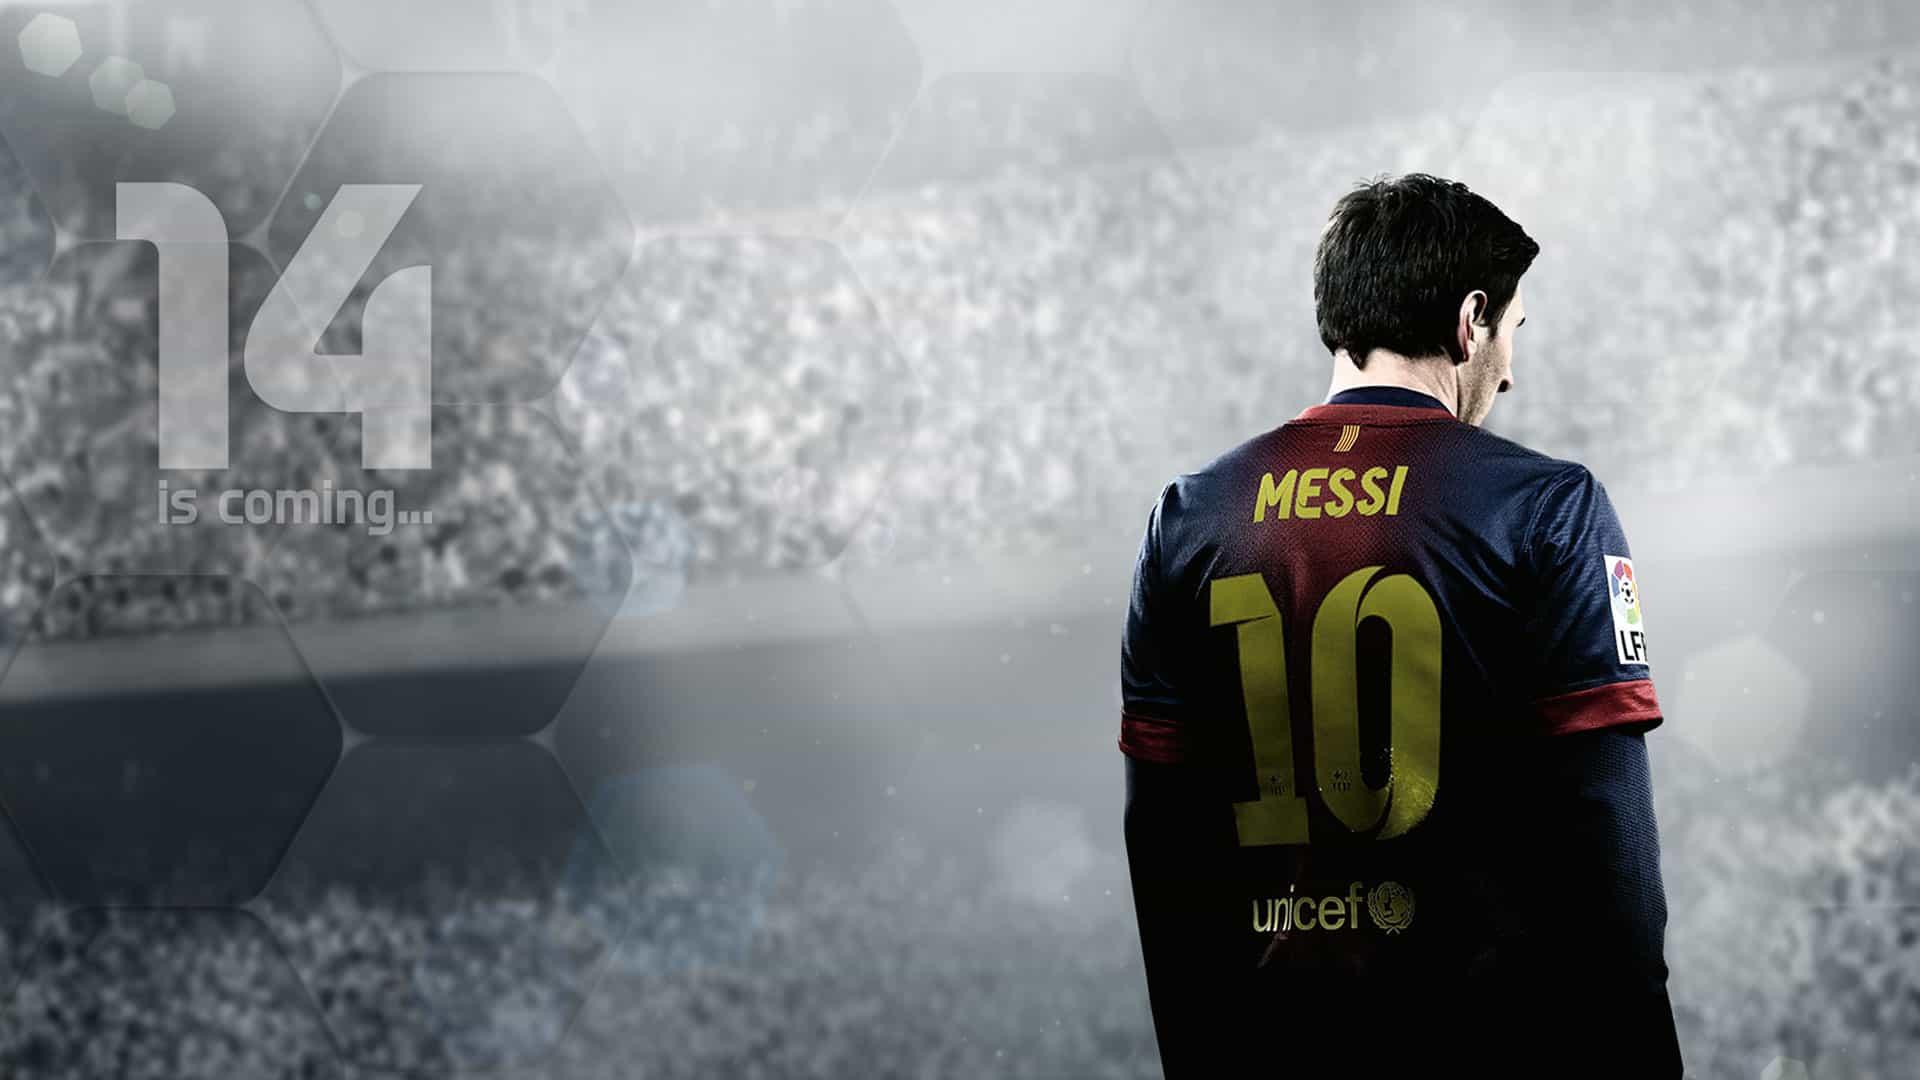 Fifa 14 Game HD Wallpaper